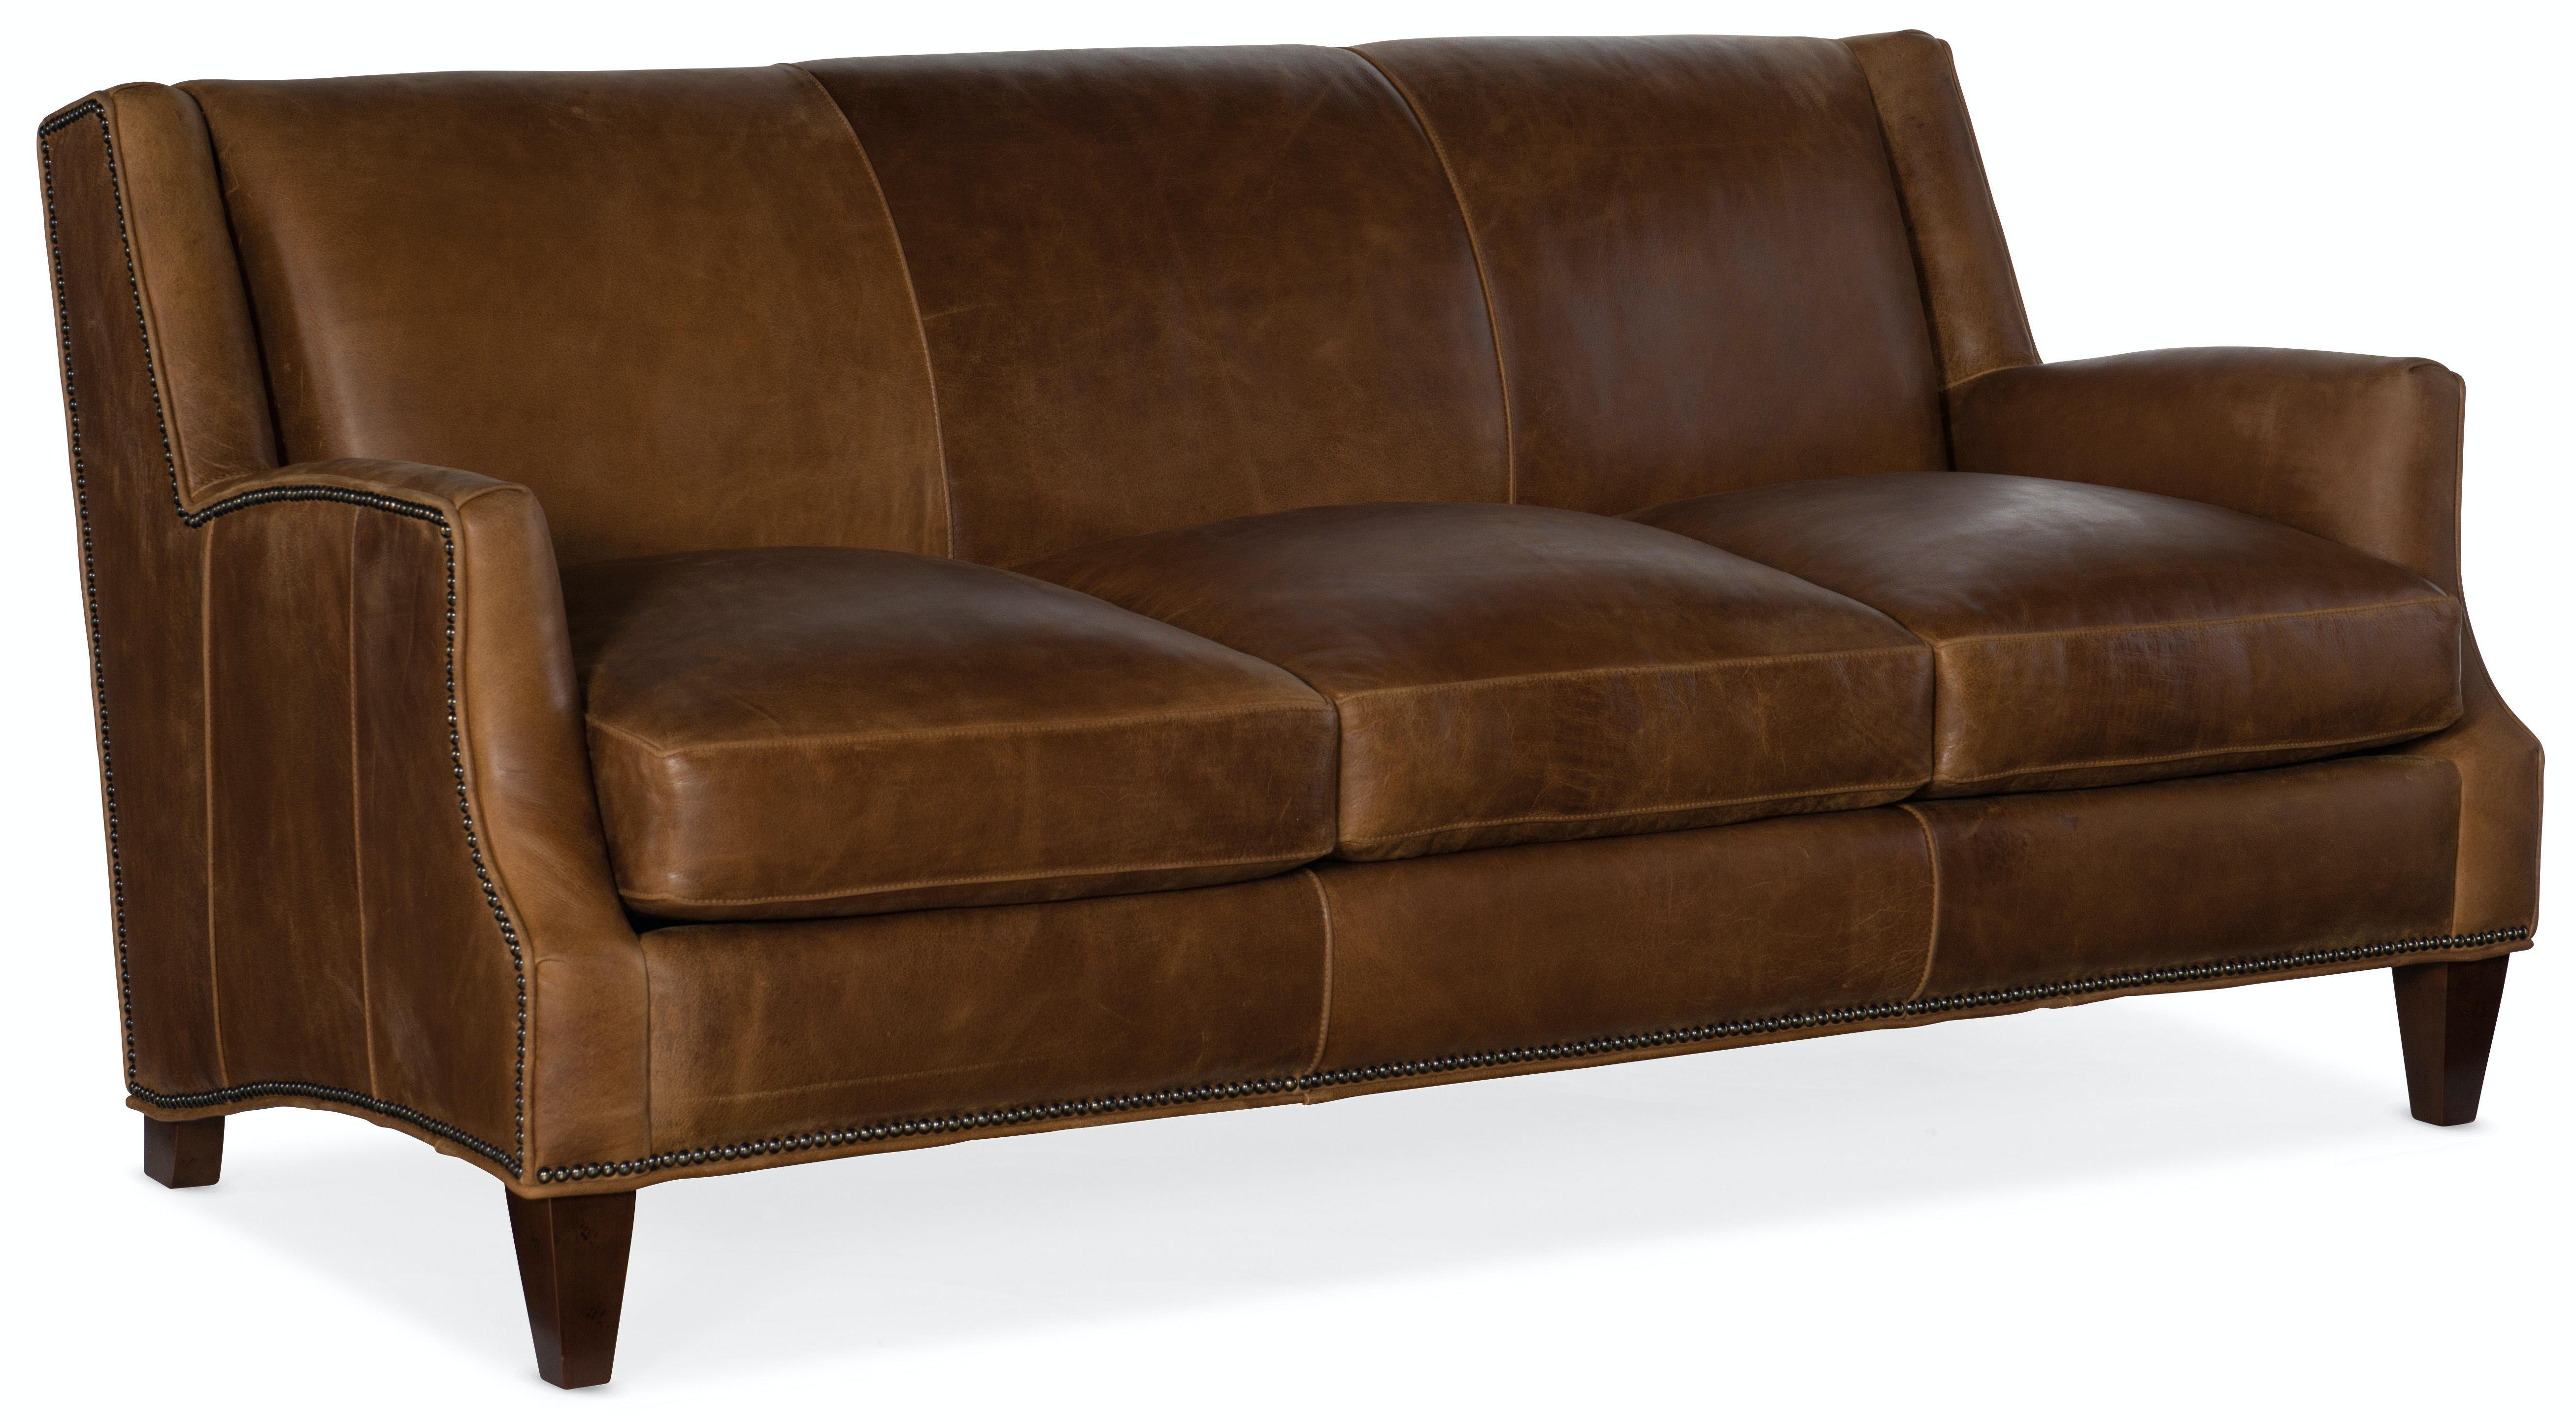 Bradington Young Living Room Kane Stationary Sofa 8 Way Tie 413 95